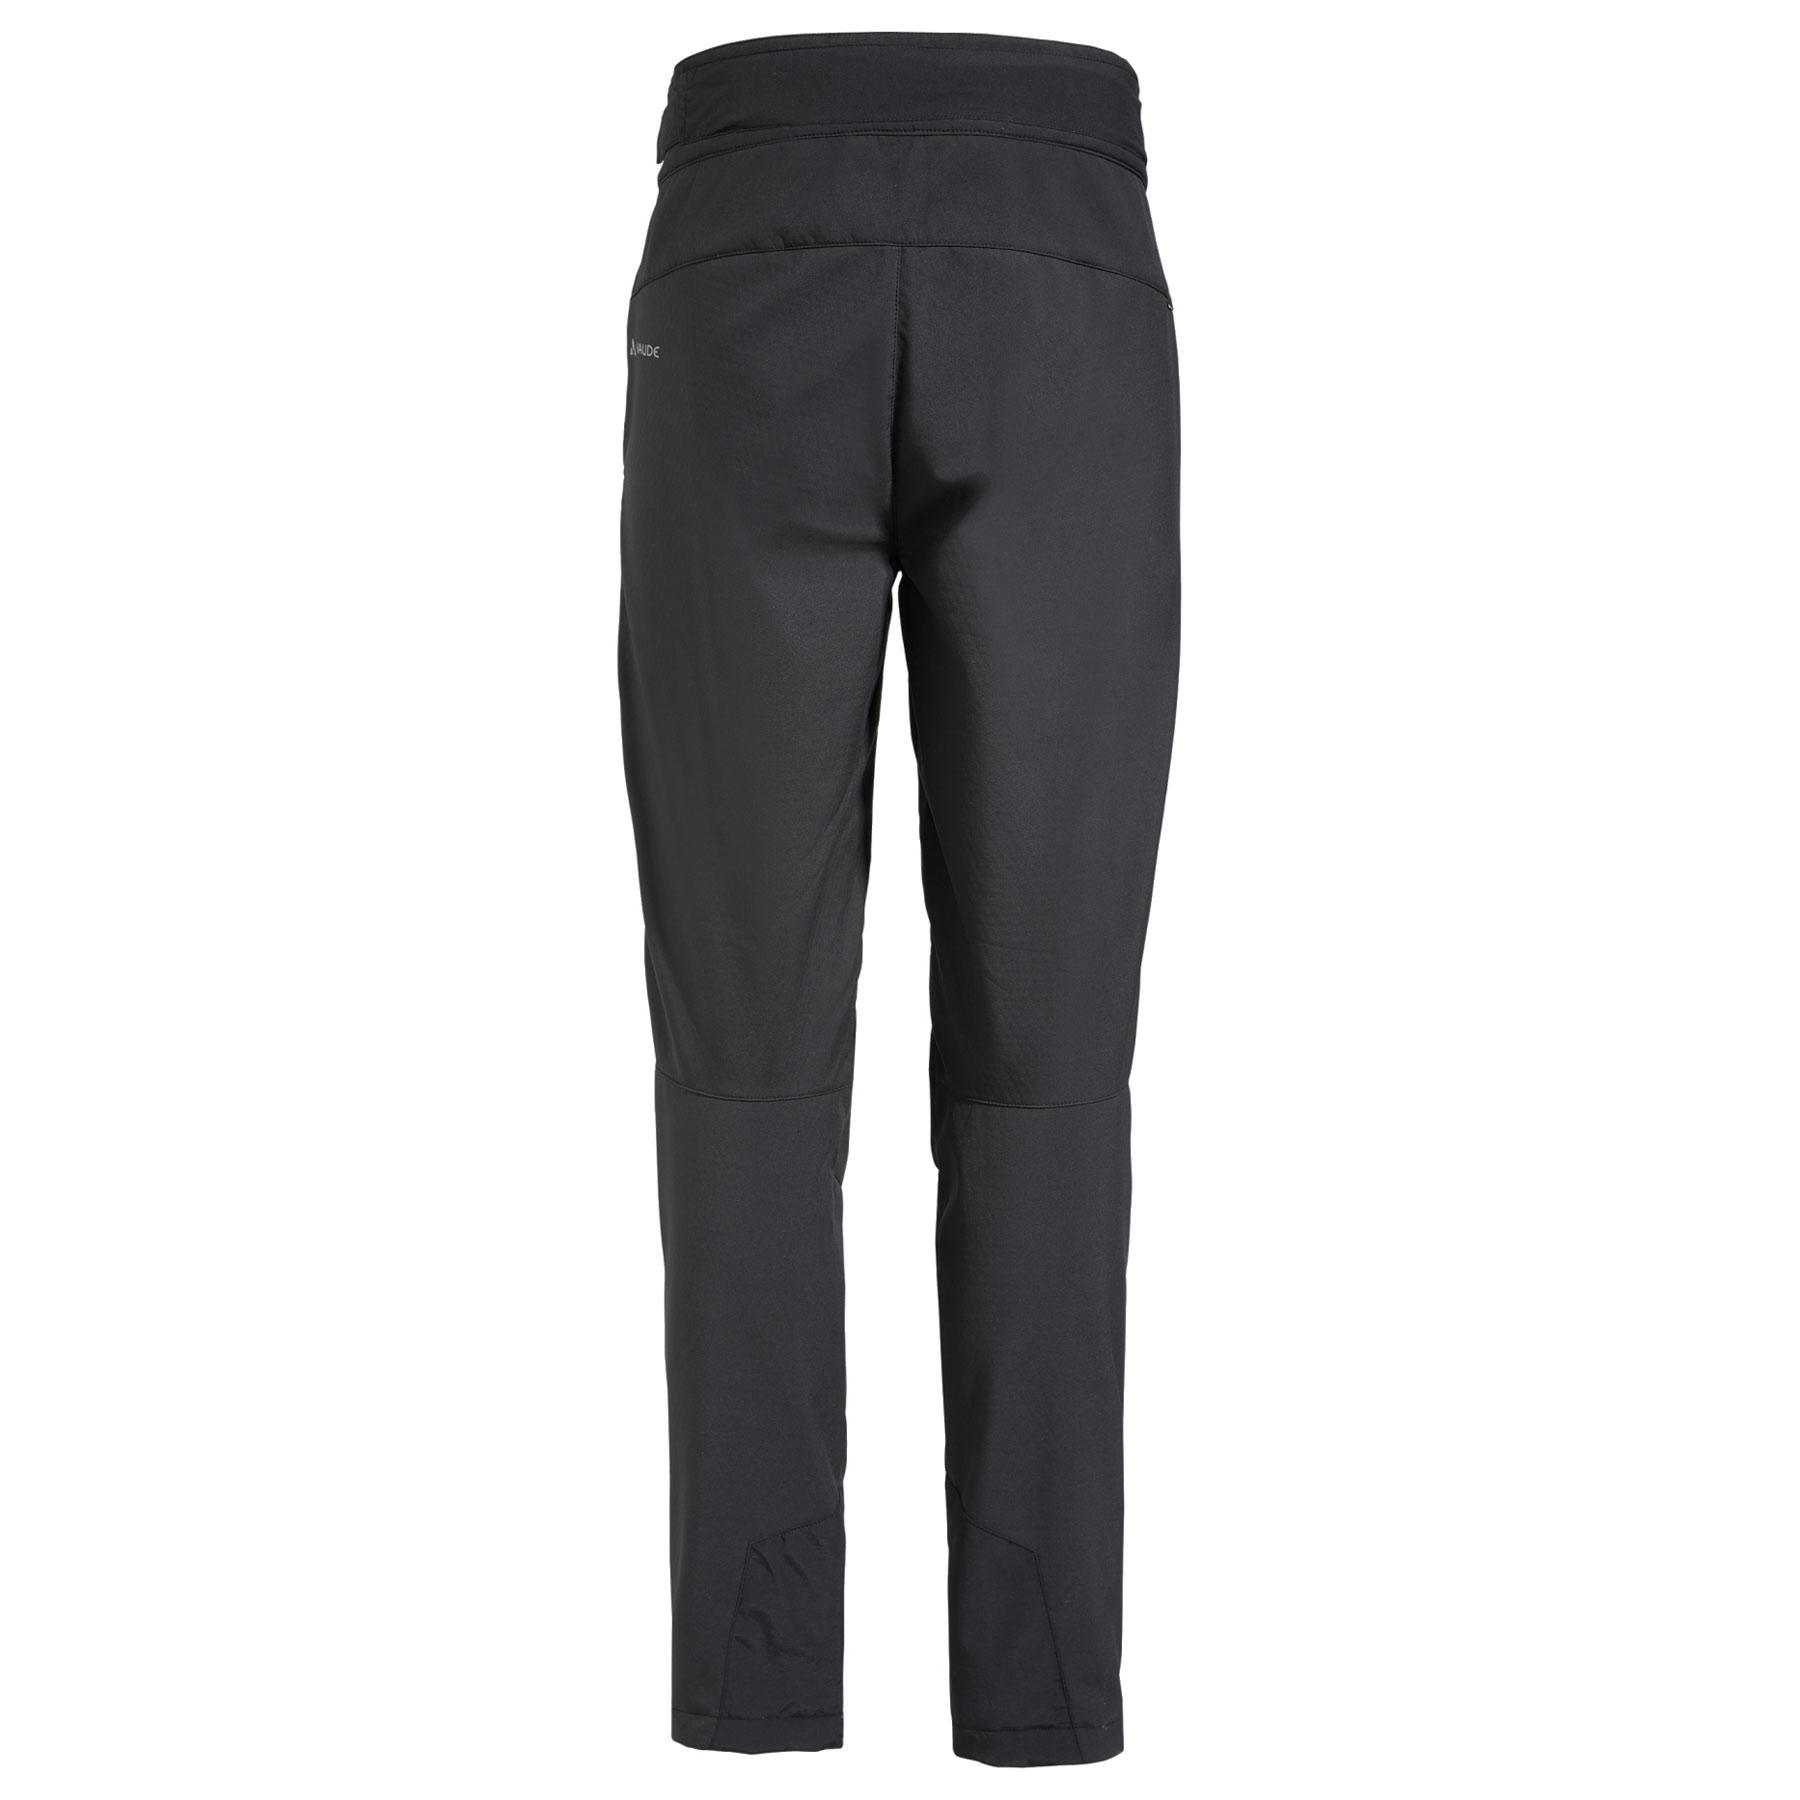 Image of Vaude Men's Zetar Softshell Pants - black